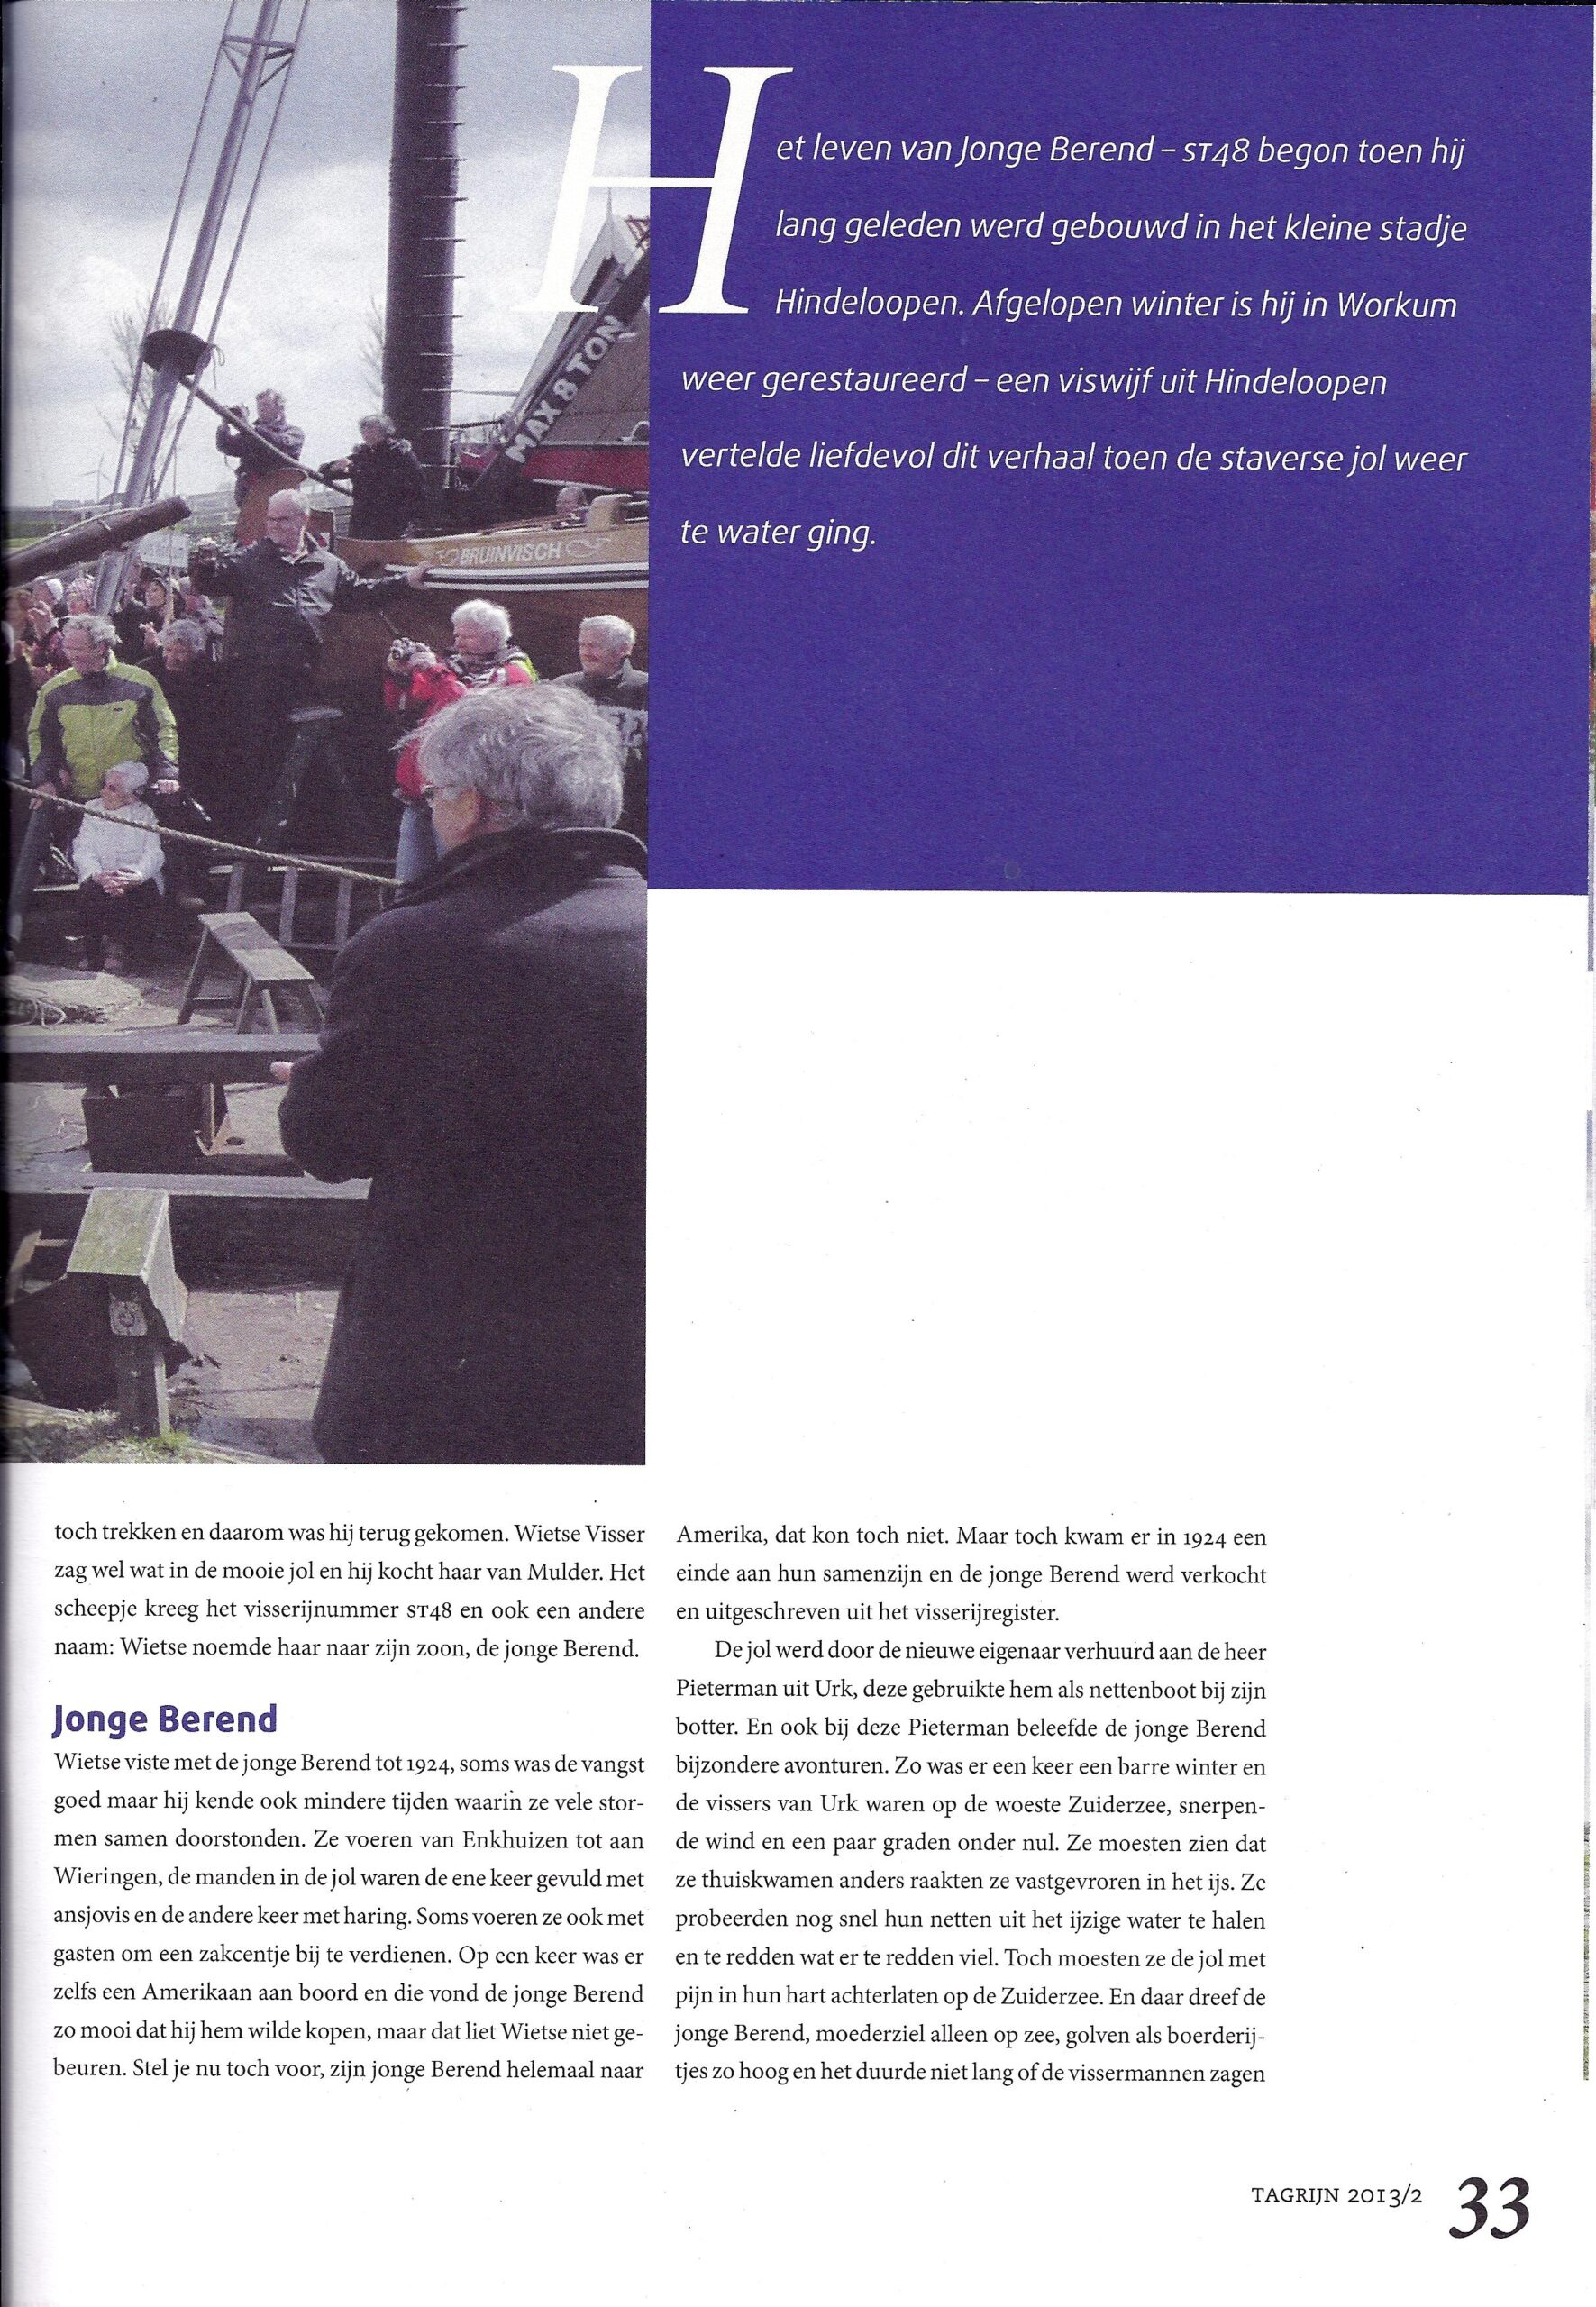 Tagrijn 2013 |tewaterlating ST48 | Pagina 2.